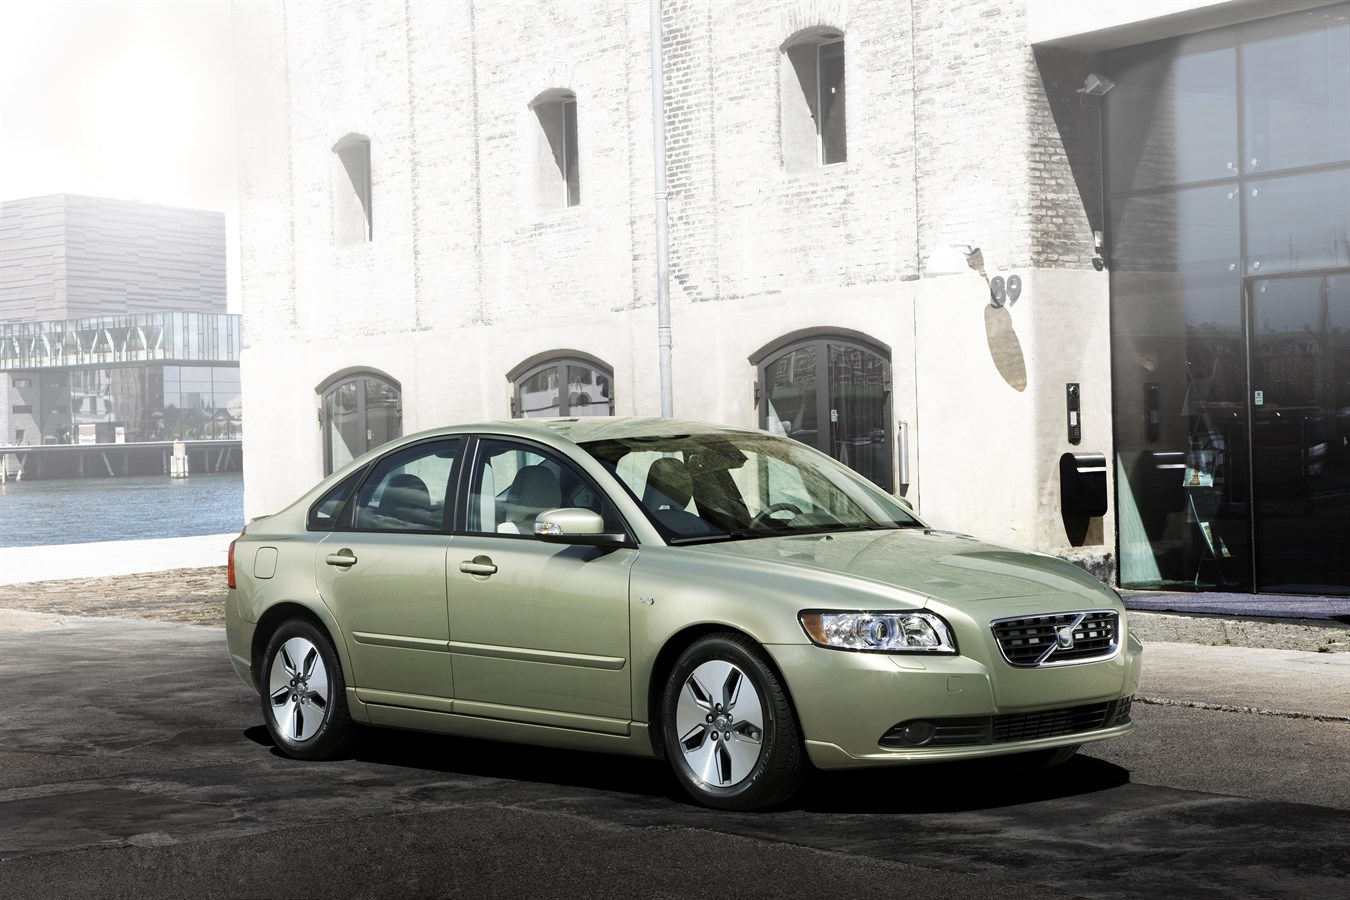 Volvo S40 - model year 2010 - Volvo Car USA Newsroom